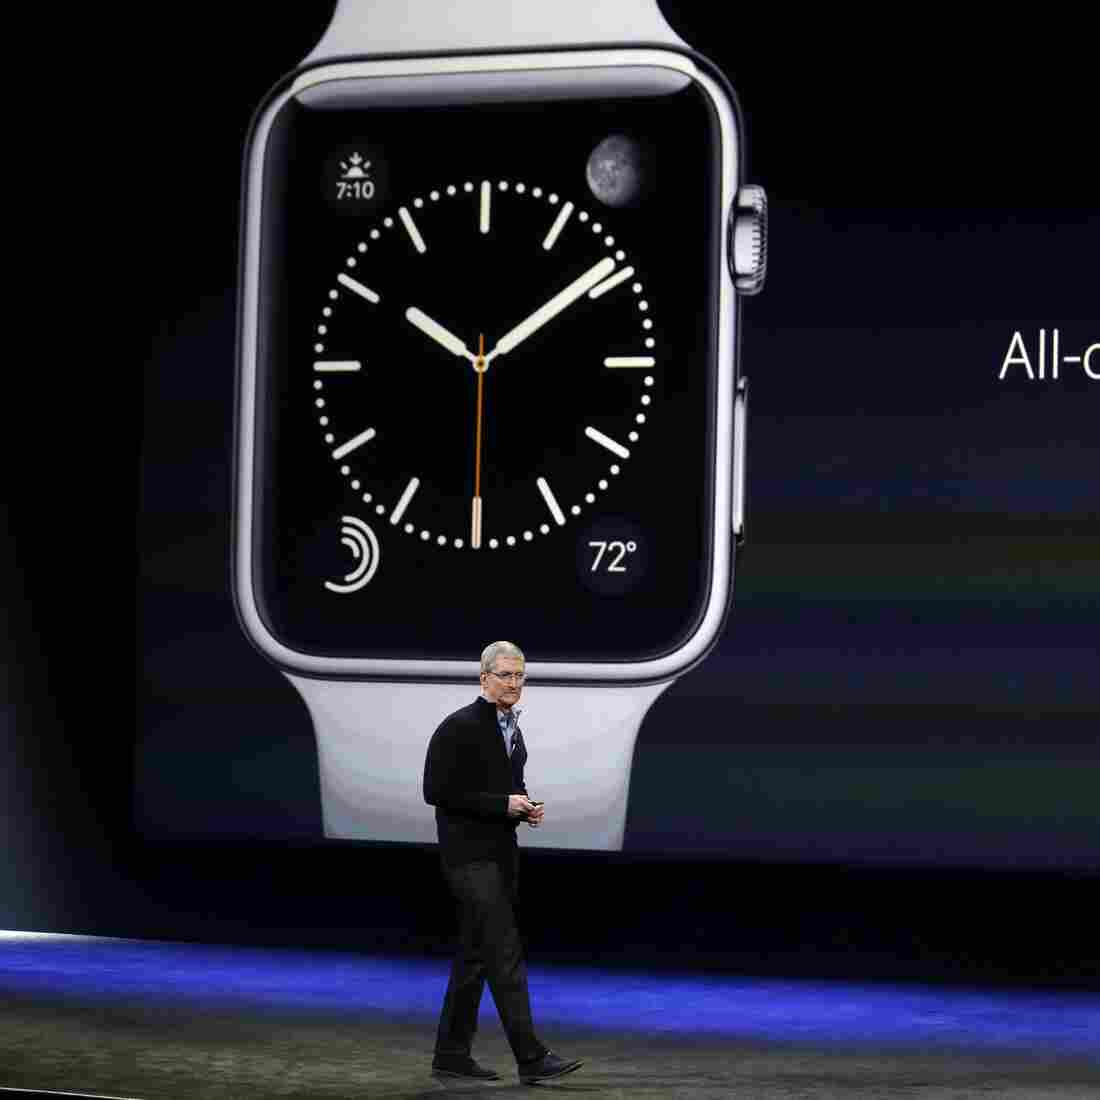 #AppleWatchEvent: Apple Reveals Its Much-Anticipated Smart Watch